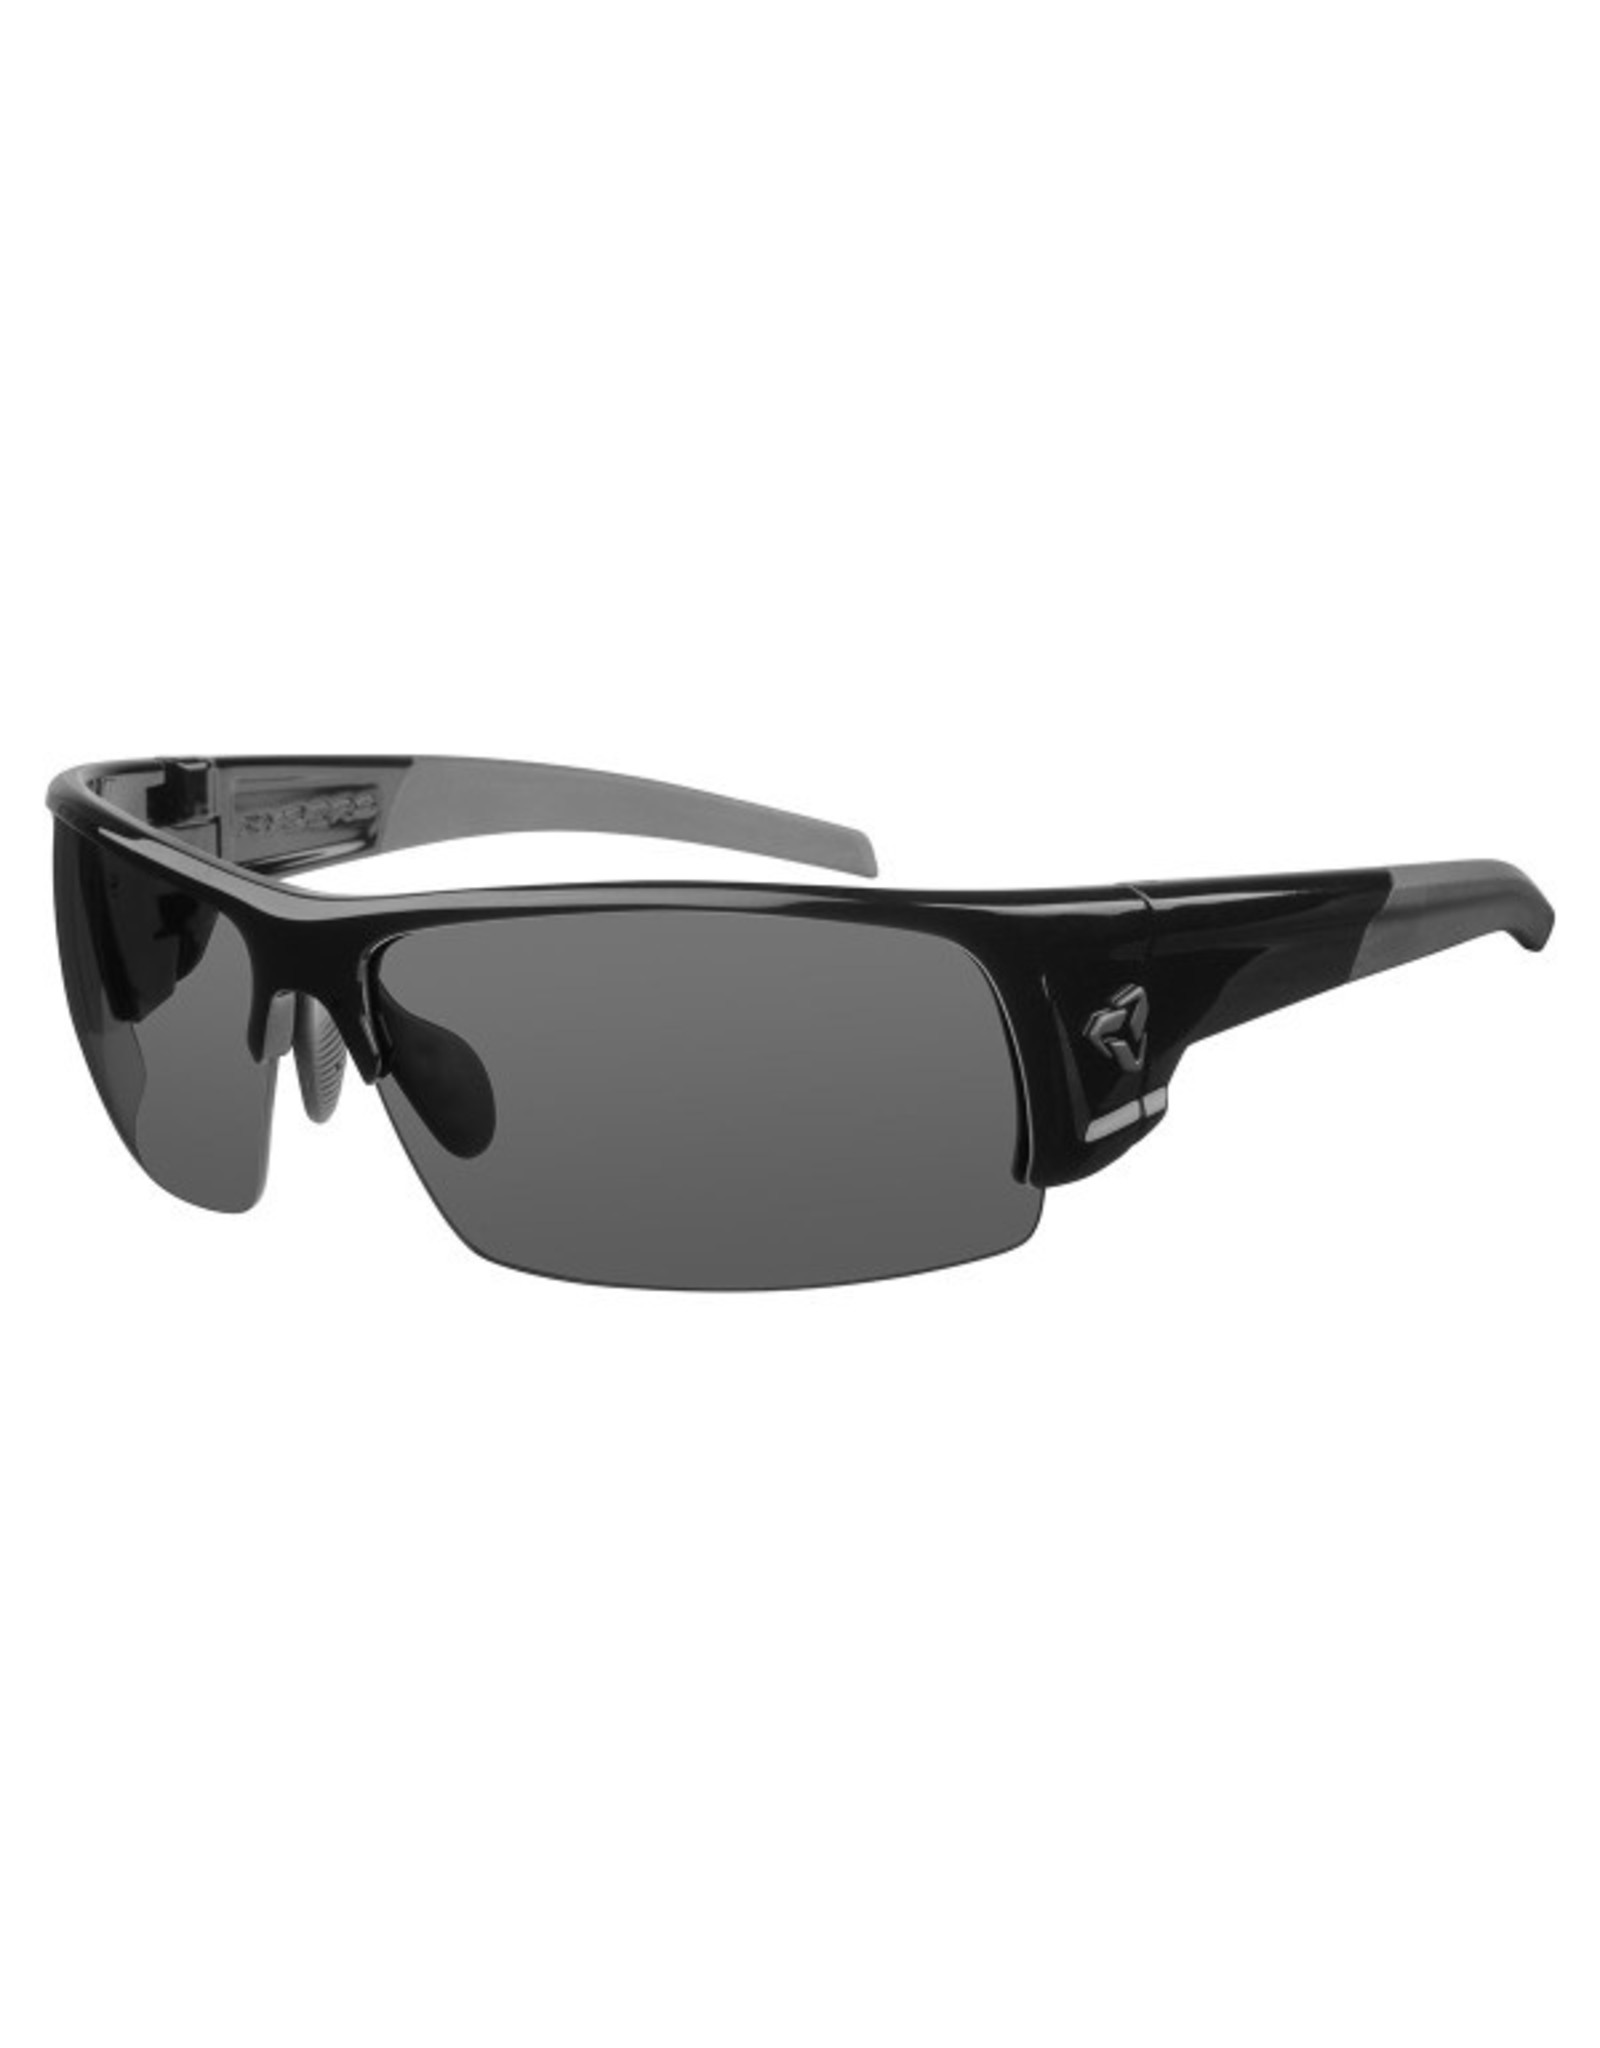 Ryders Eyewear - Caliber Poly Black/Grey Lens